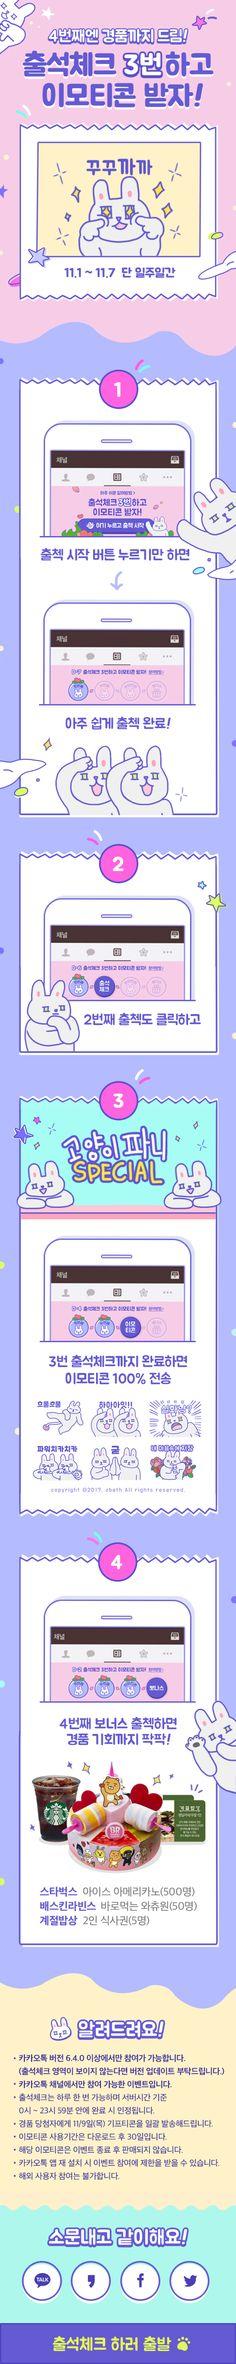 Event Banner, Web Banner, Graphic Design Posters, Graphic Design Illustration, Page Design, Web Design, Vaporwave Wallpaper, Korea Design, Cosmetic Design